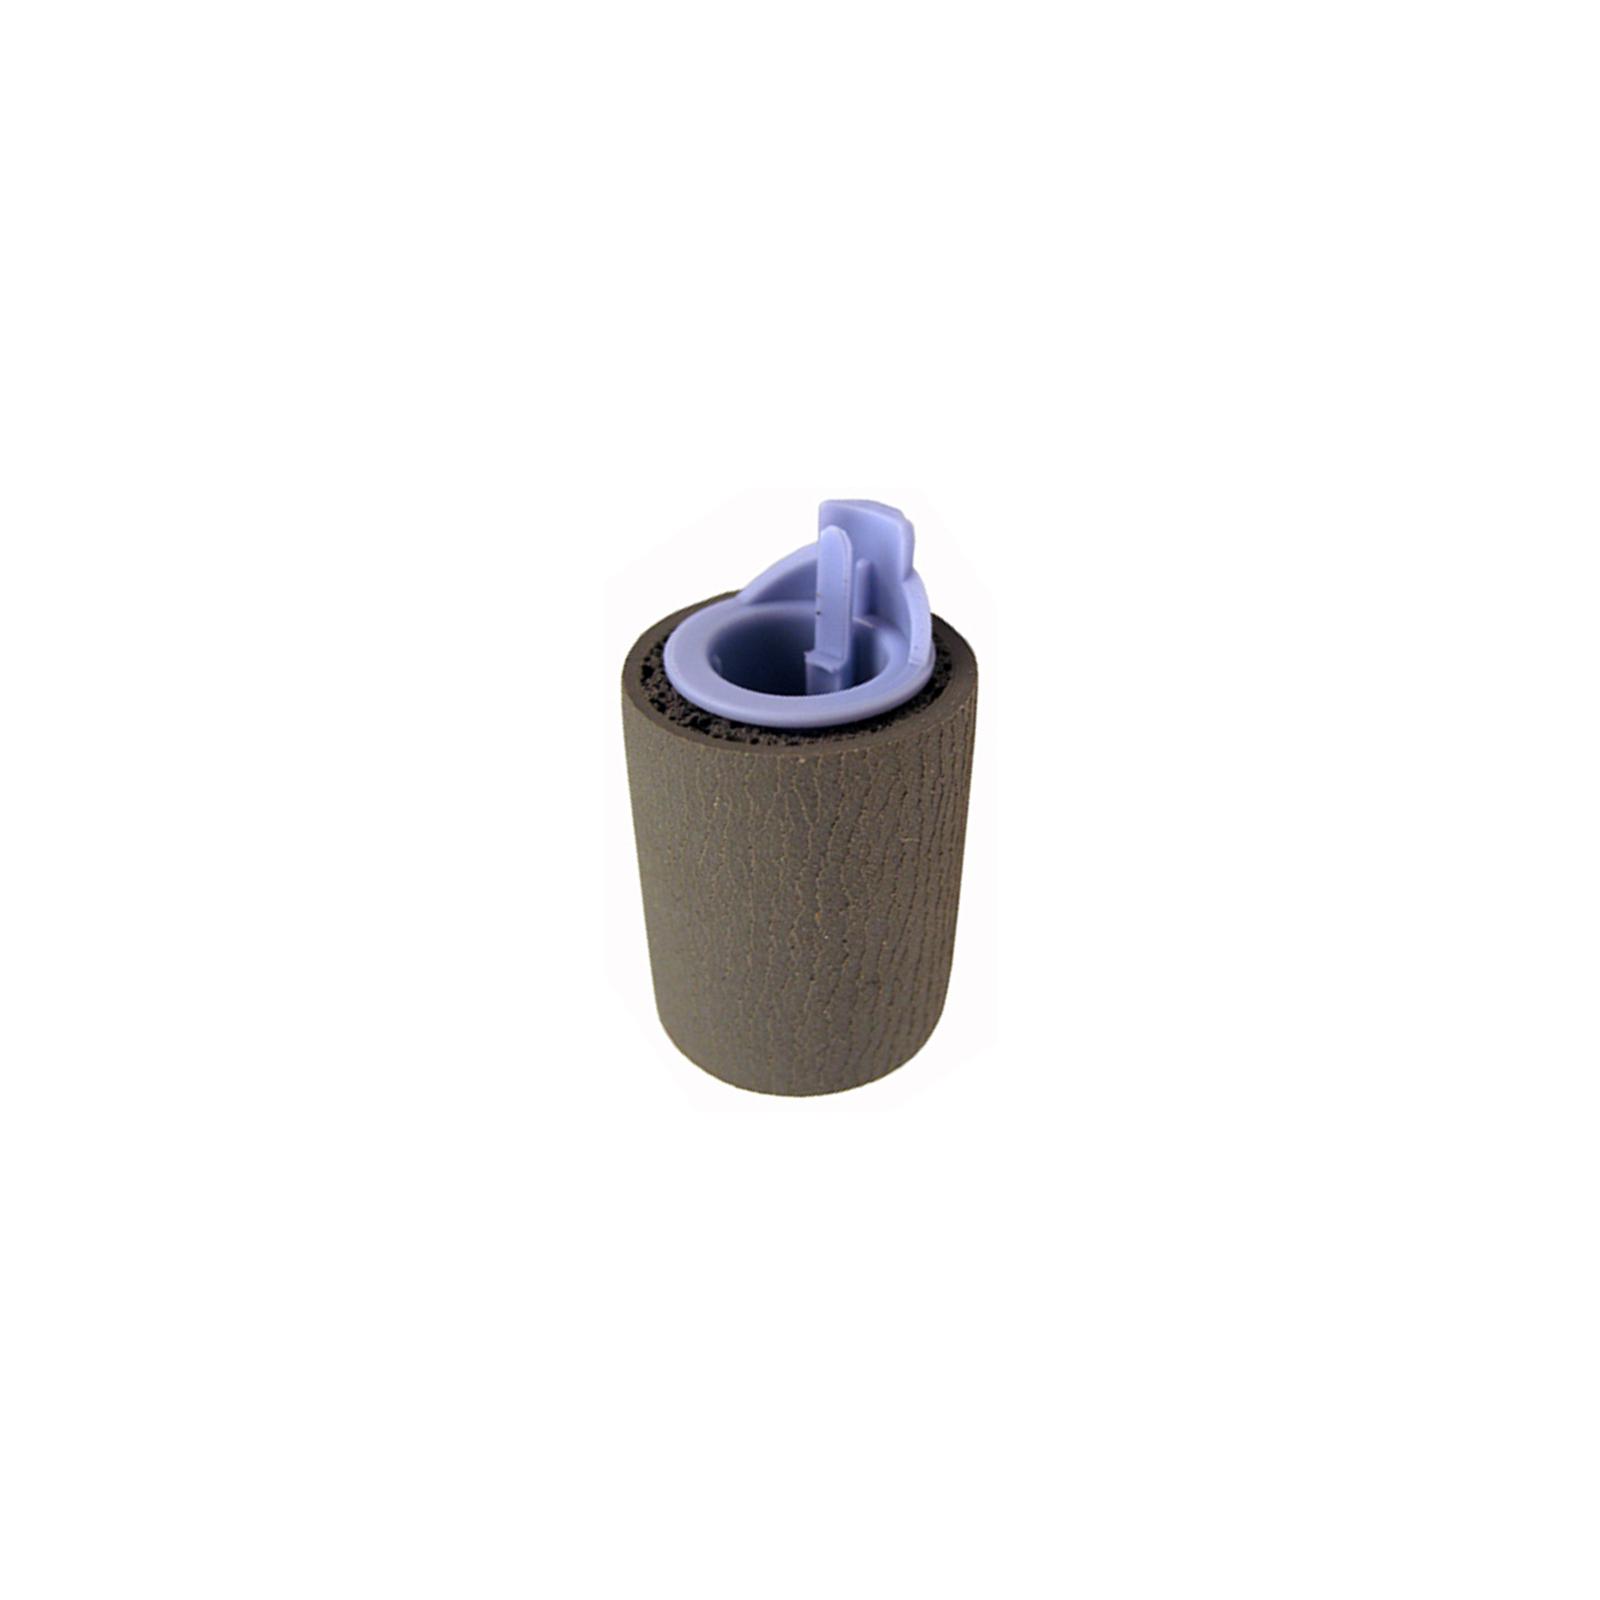 Ролик Pickup Roller для HP LJ 4250/4350 PATRON (ROL-HP-RM1-0037-PN)